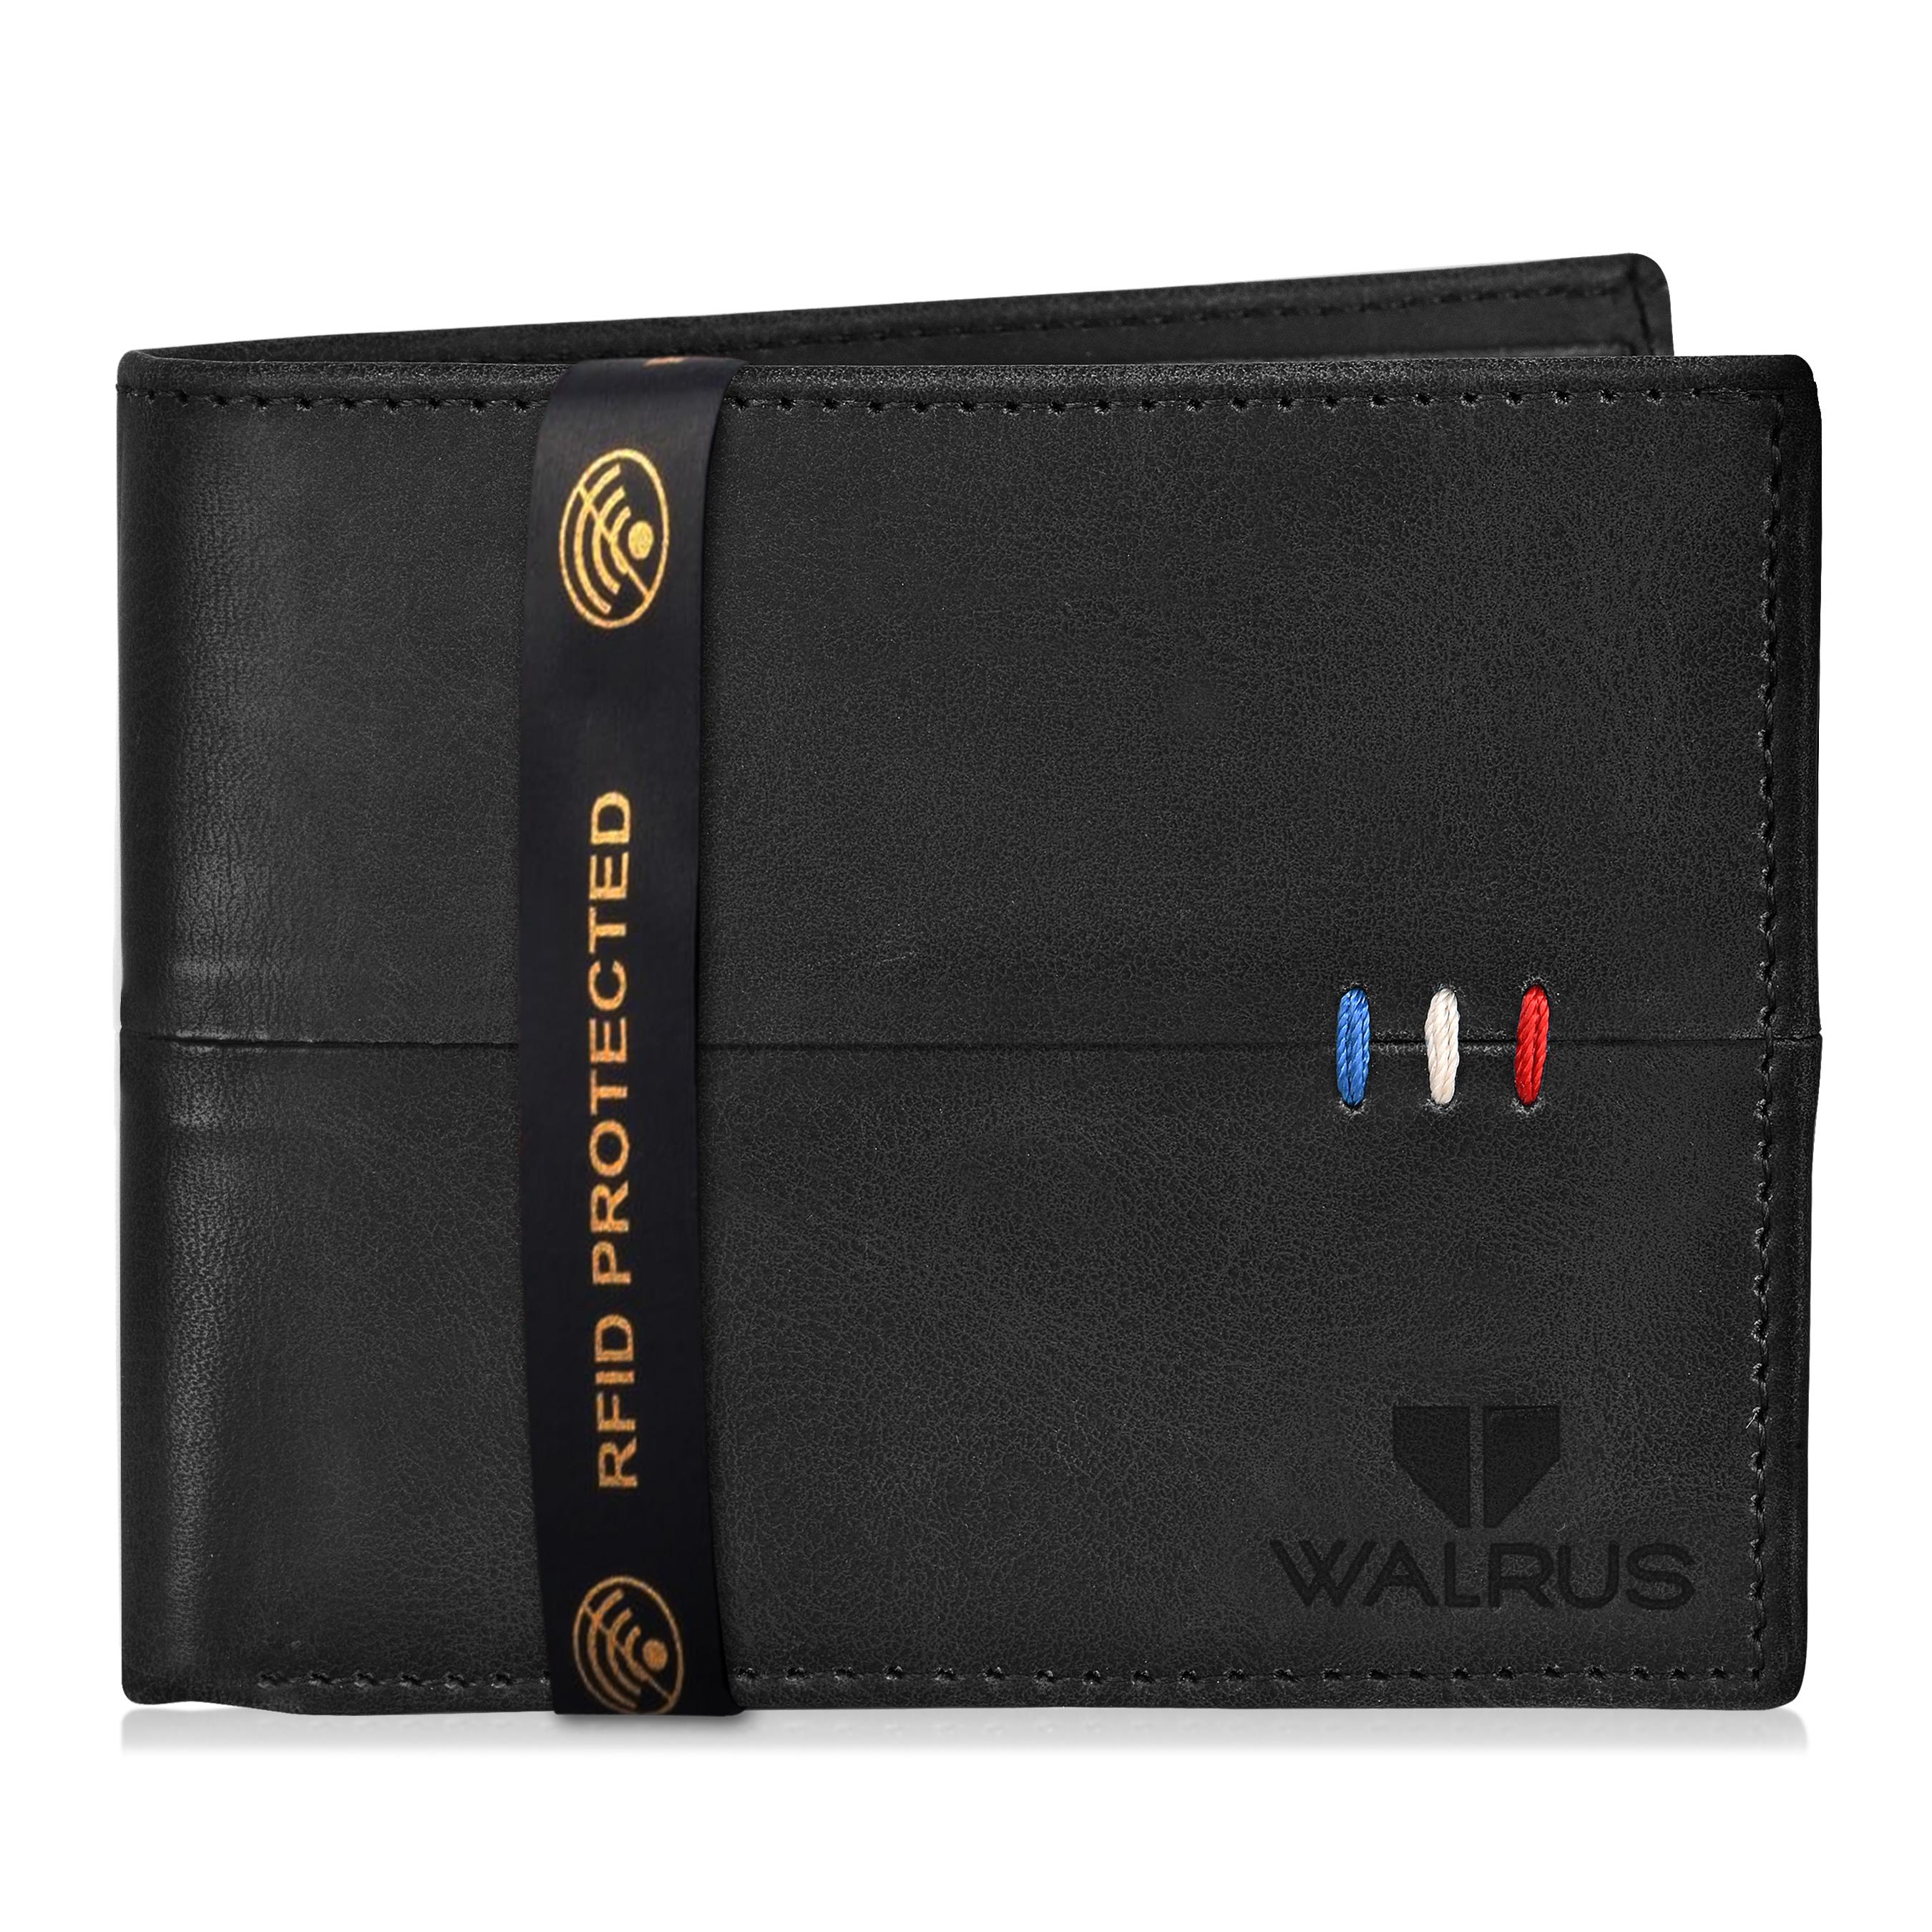 Walrus | Walrus Daniel-II Black Vegan Leather Men Wallet With RFID Protection.